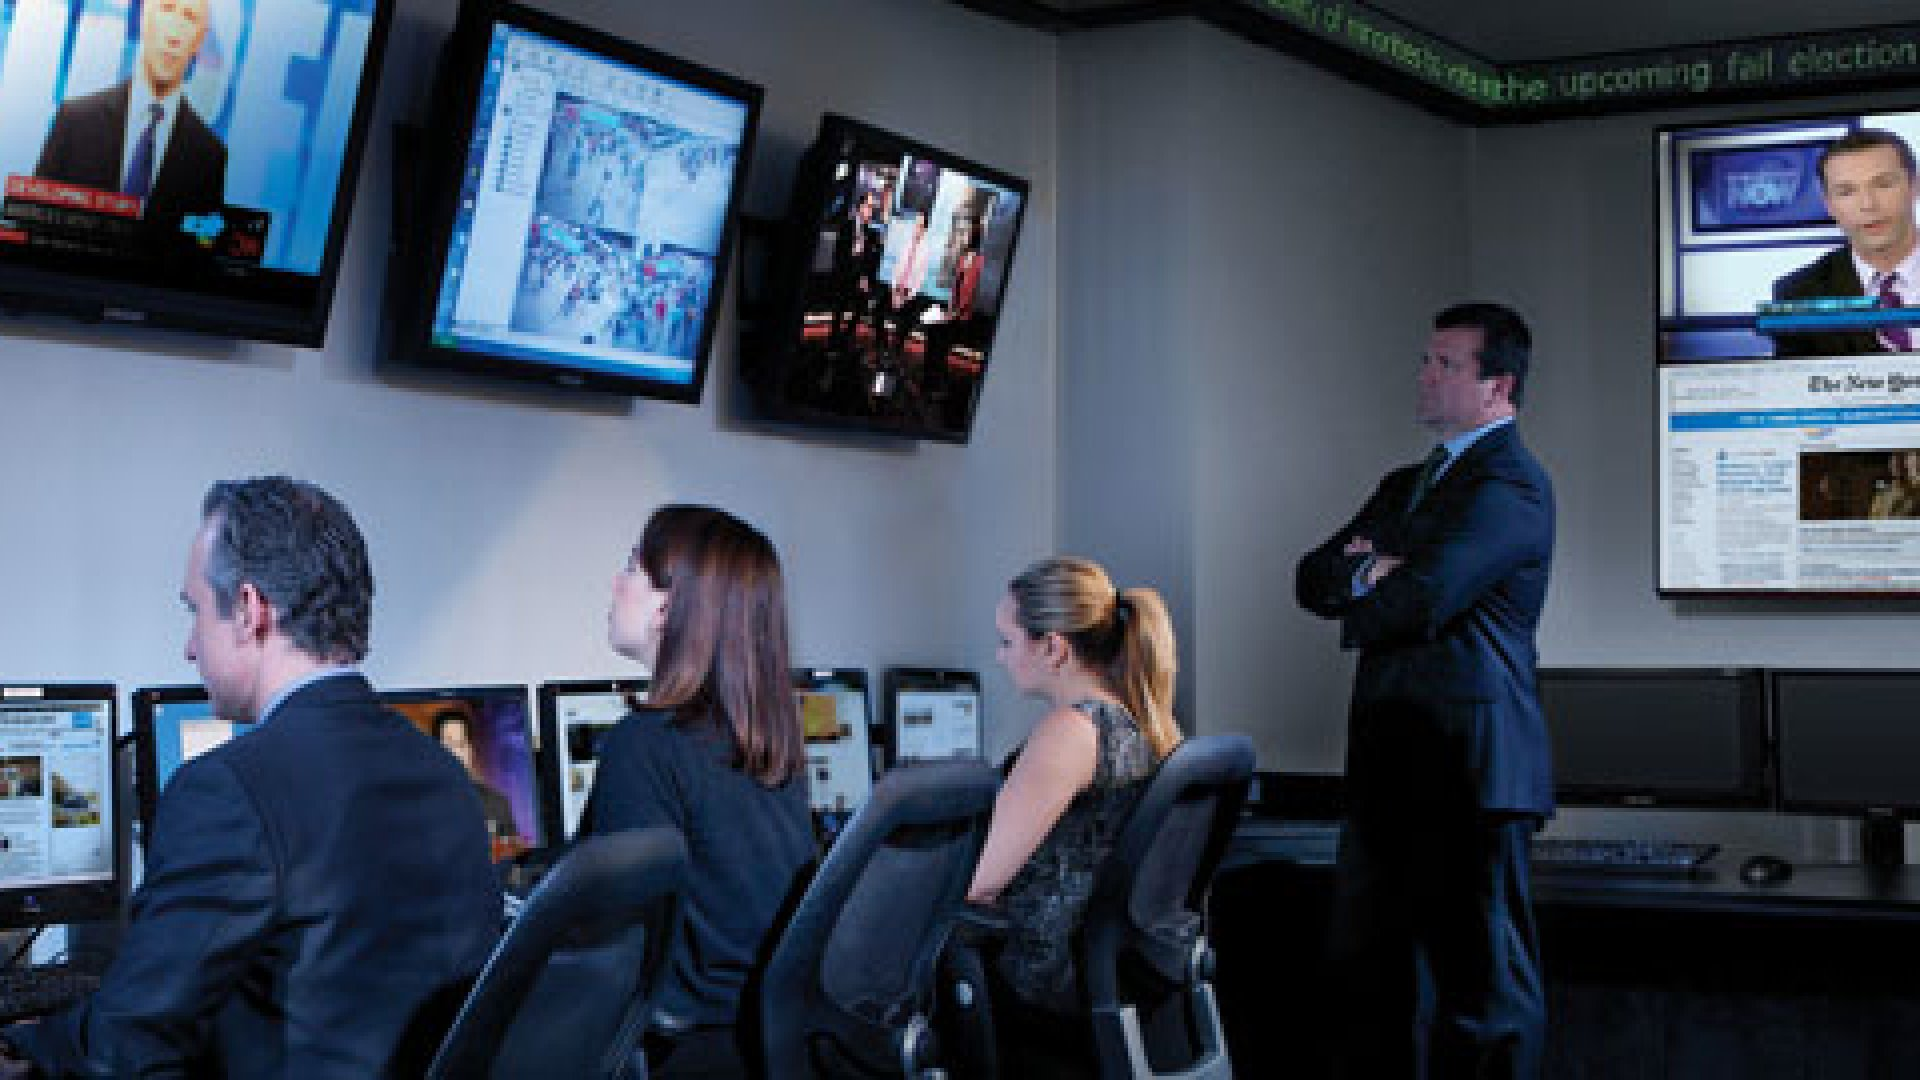 MSA Security's Intel Center in New York City.